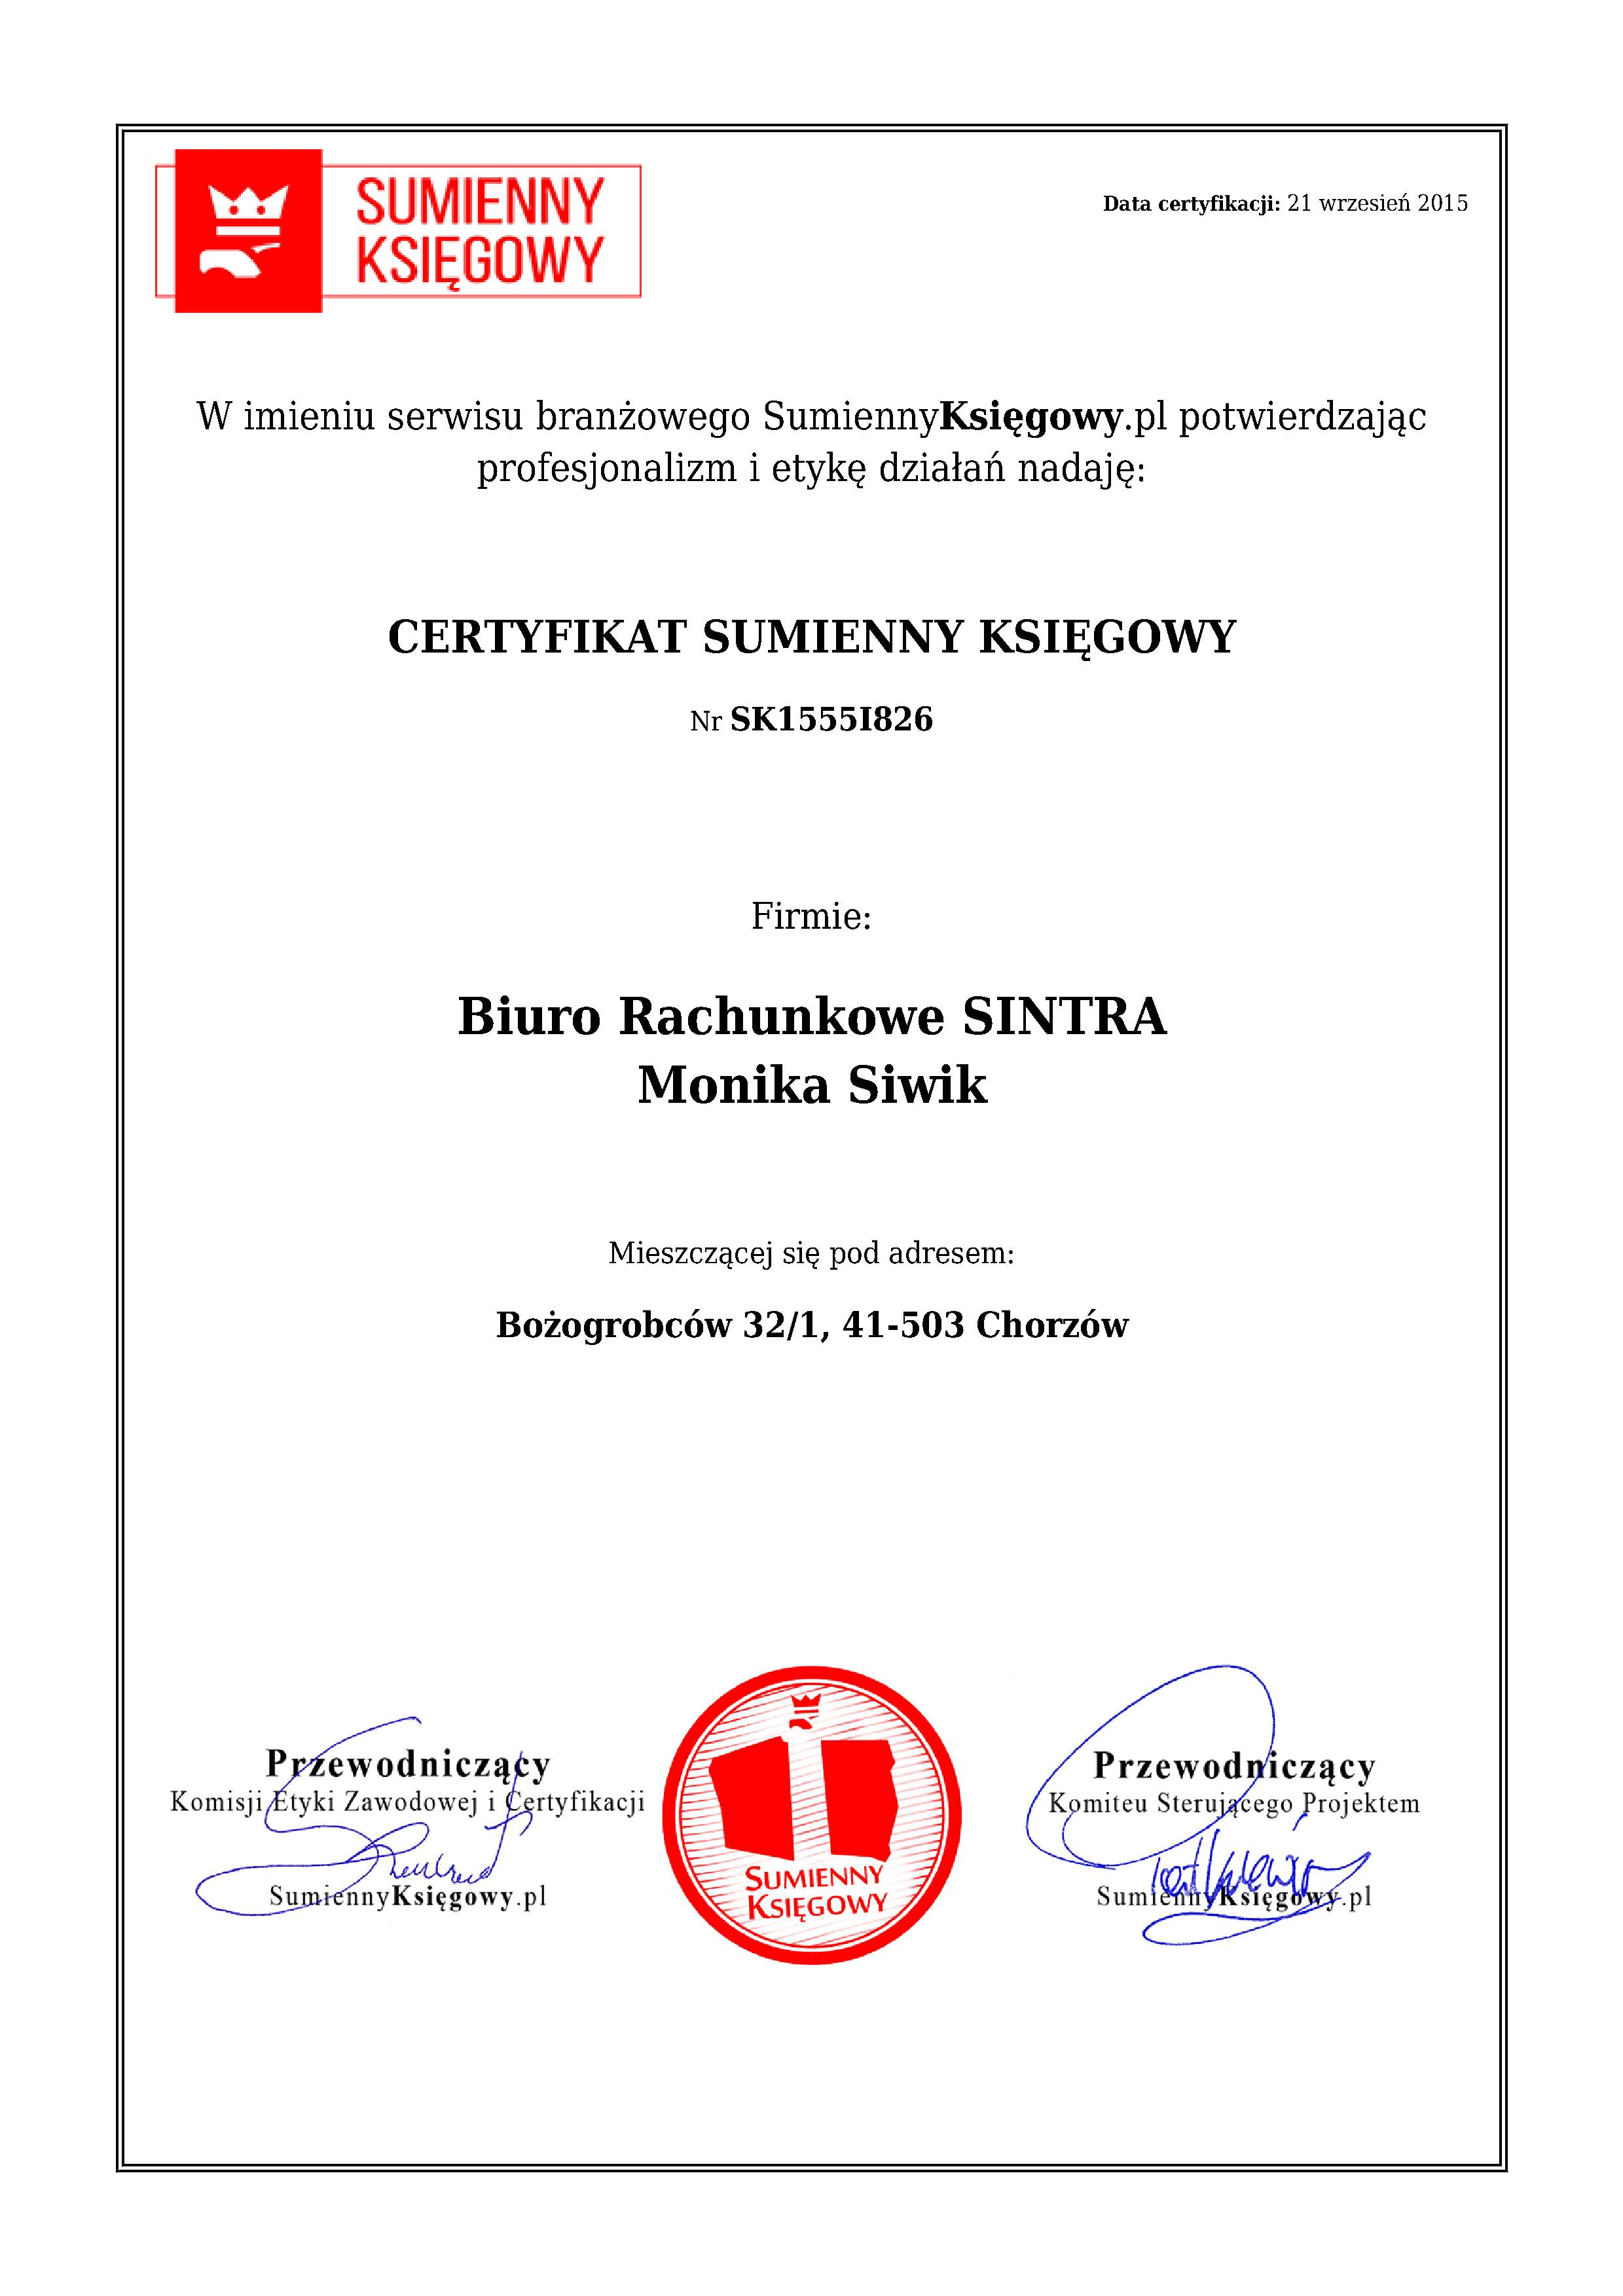 Certyfikat Biuro Rachunkowe SINTRA Monika Siwik